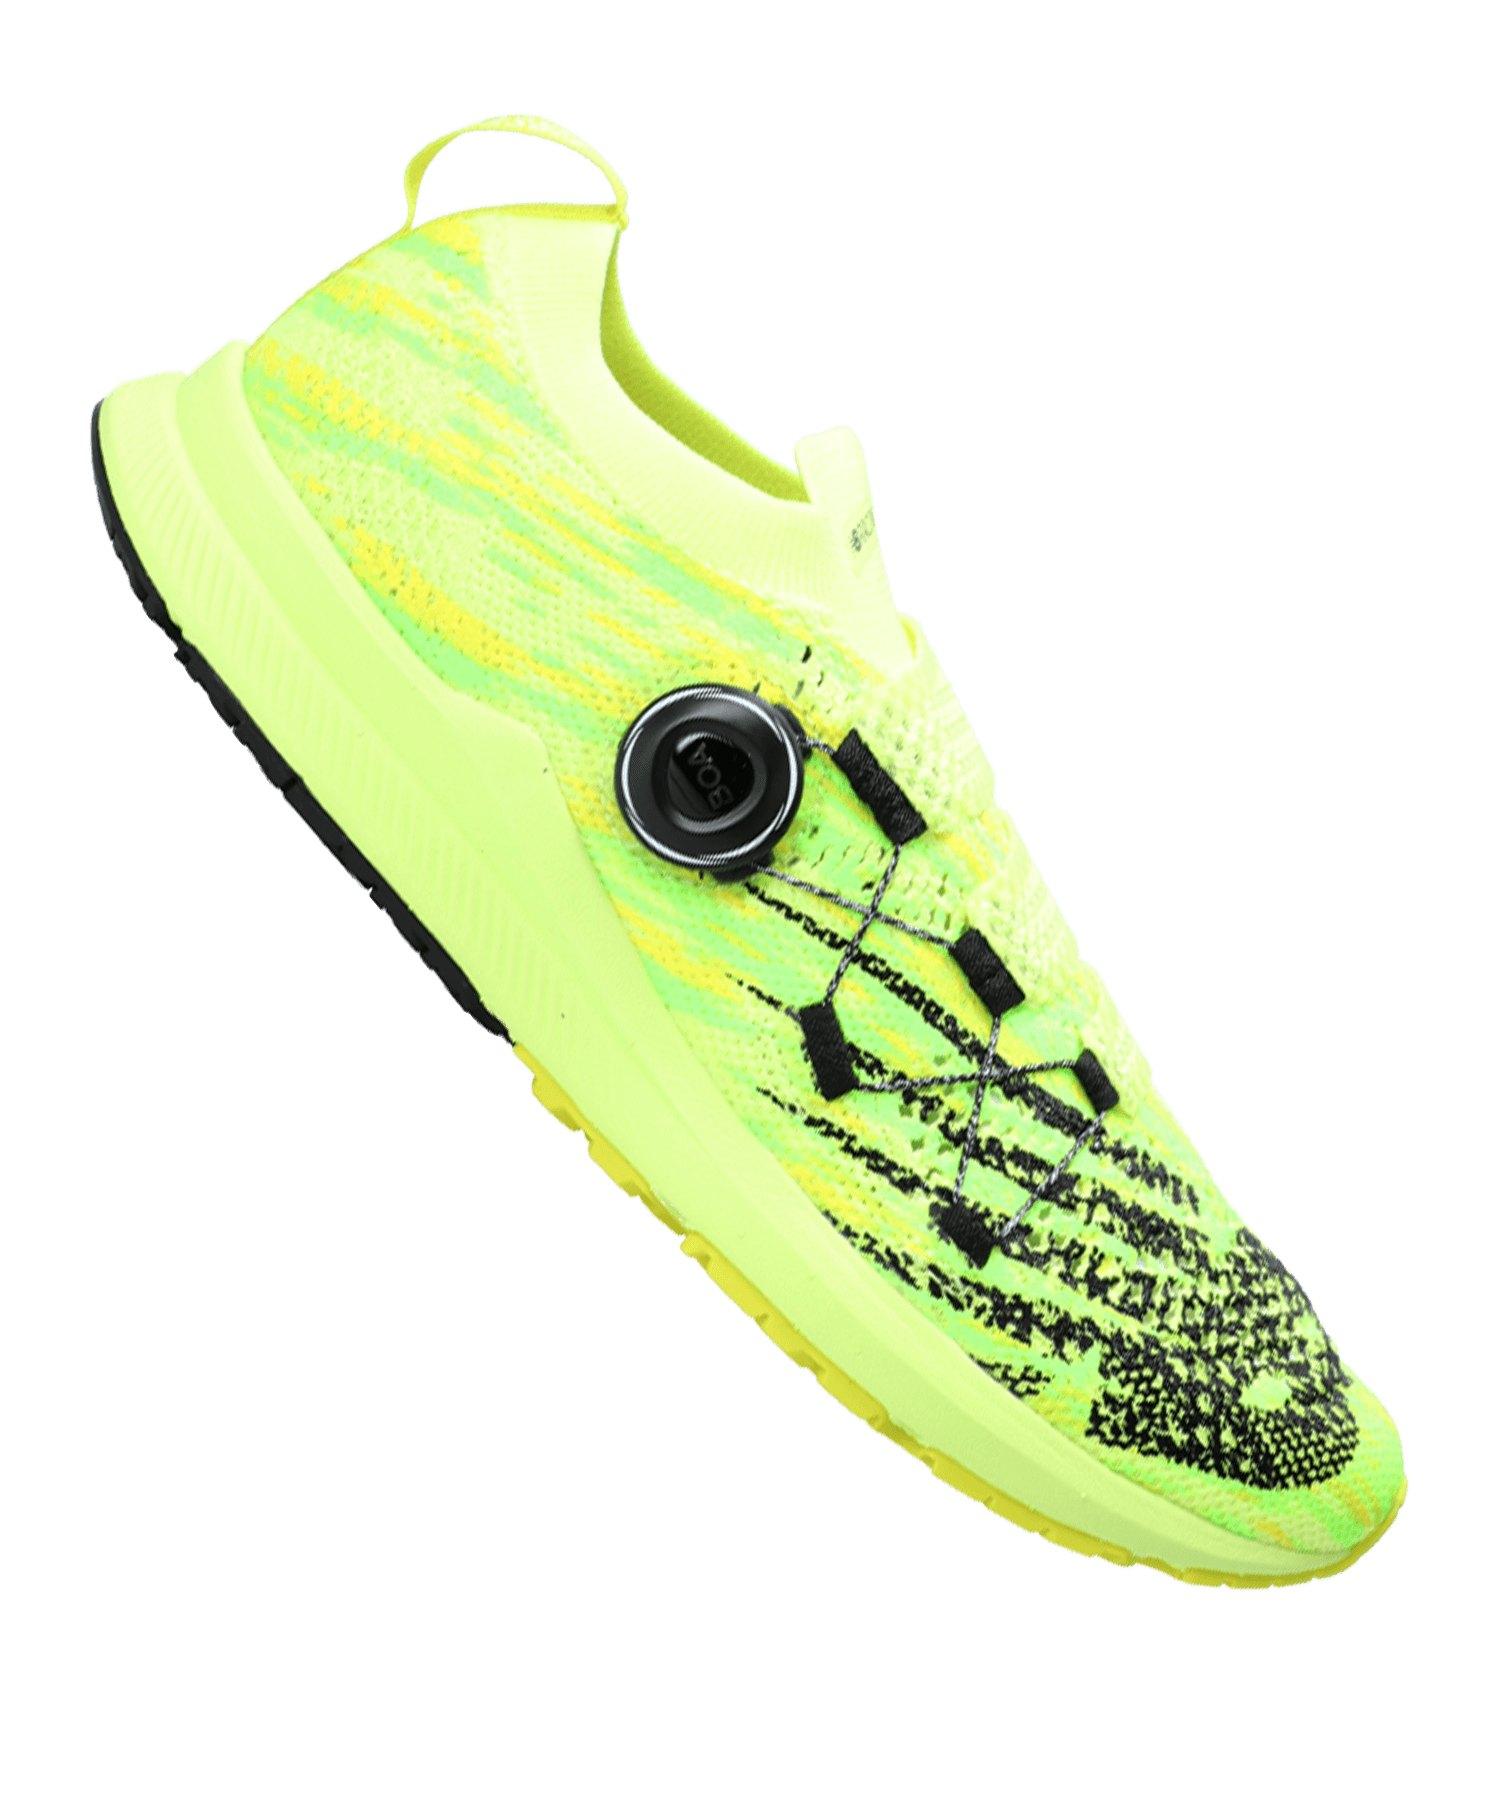 New Balance M1500 D Textile Running Gelb F7 - gelb